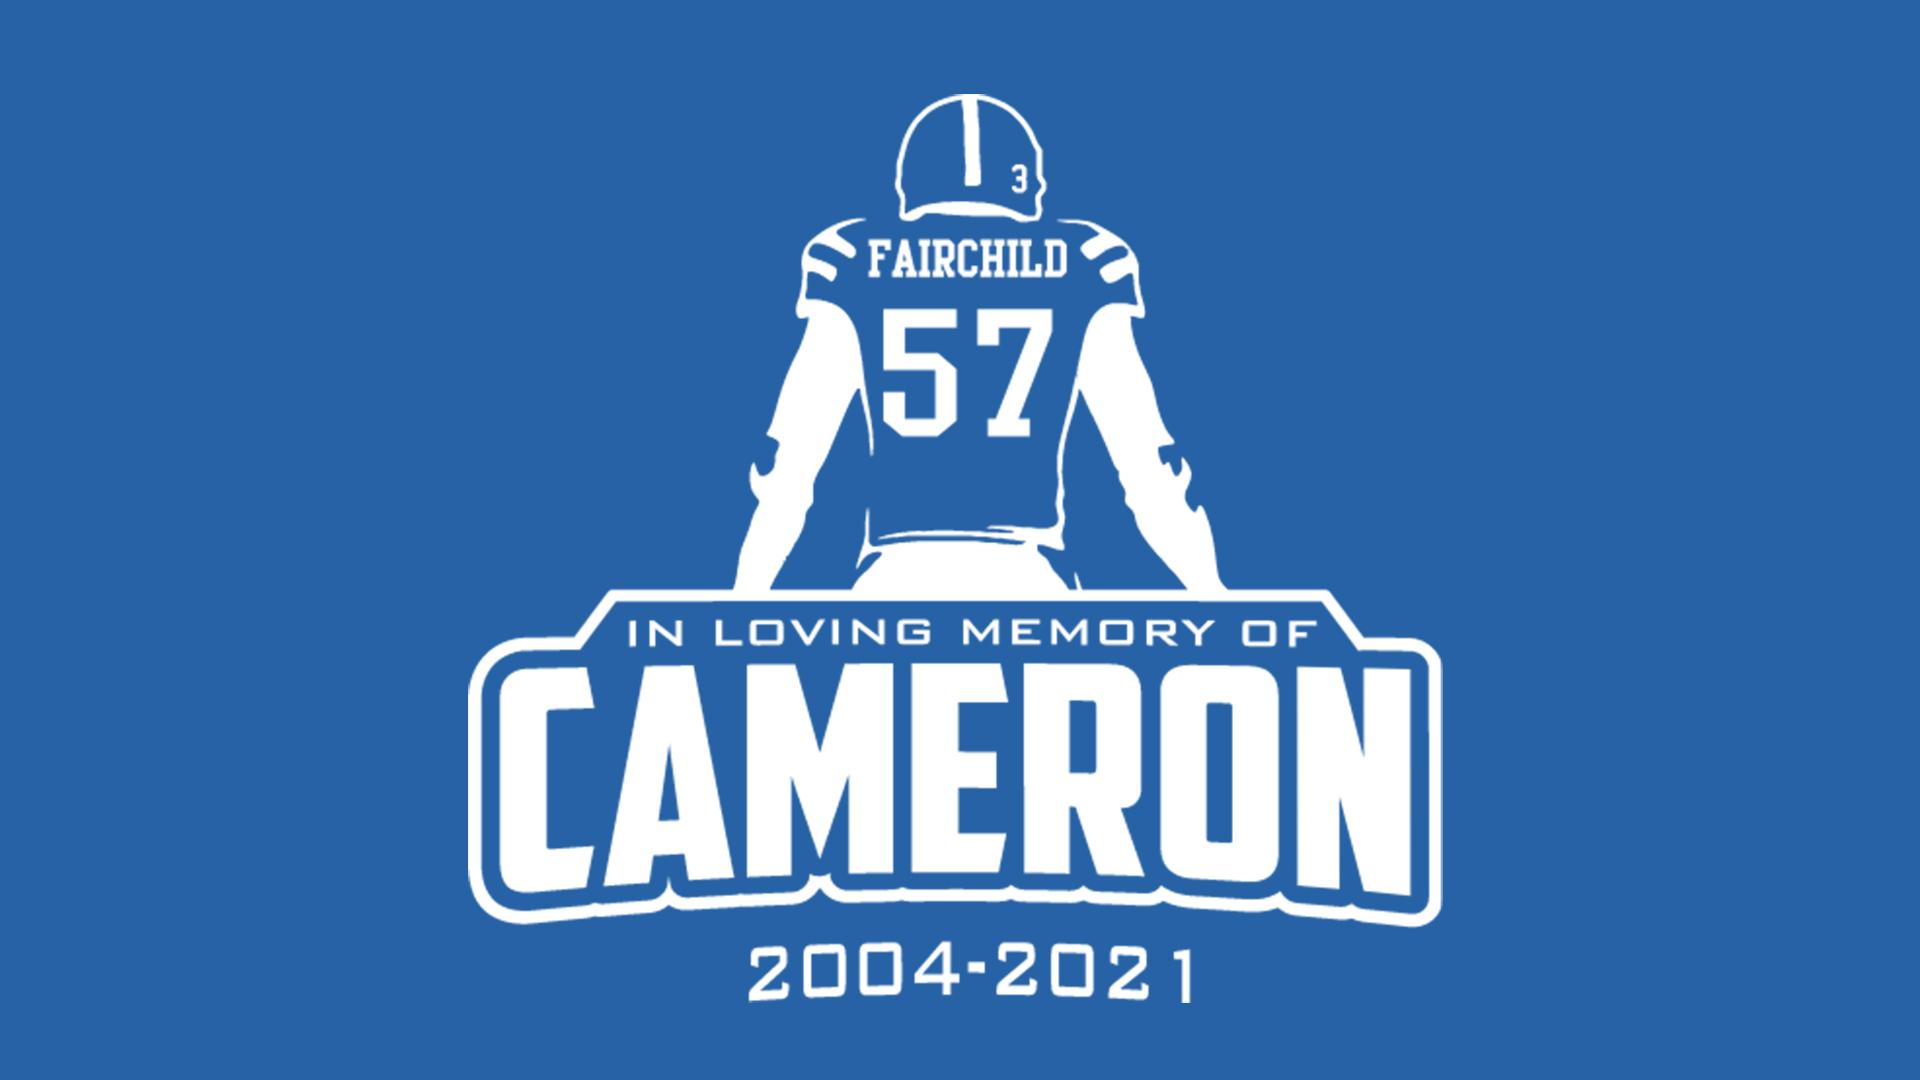 T-Shirts on Sale to Honor Cameron Fairchild